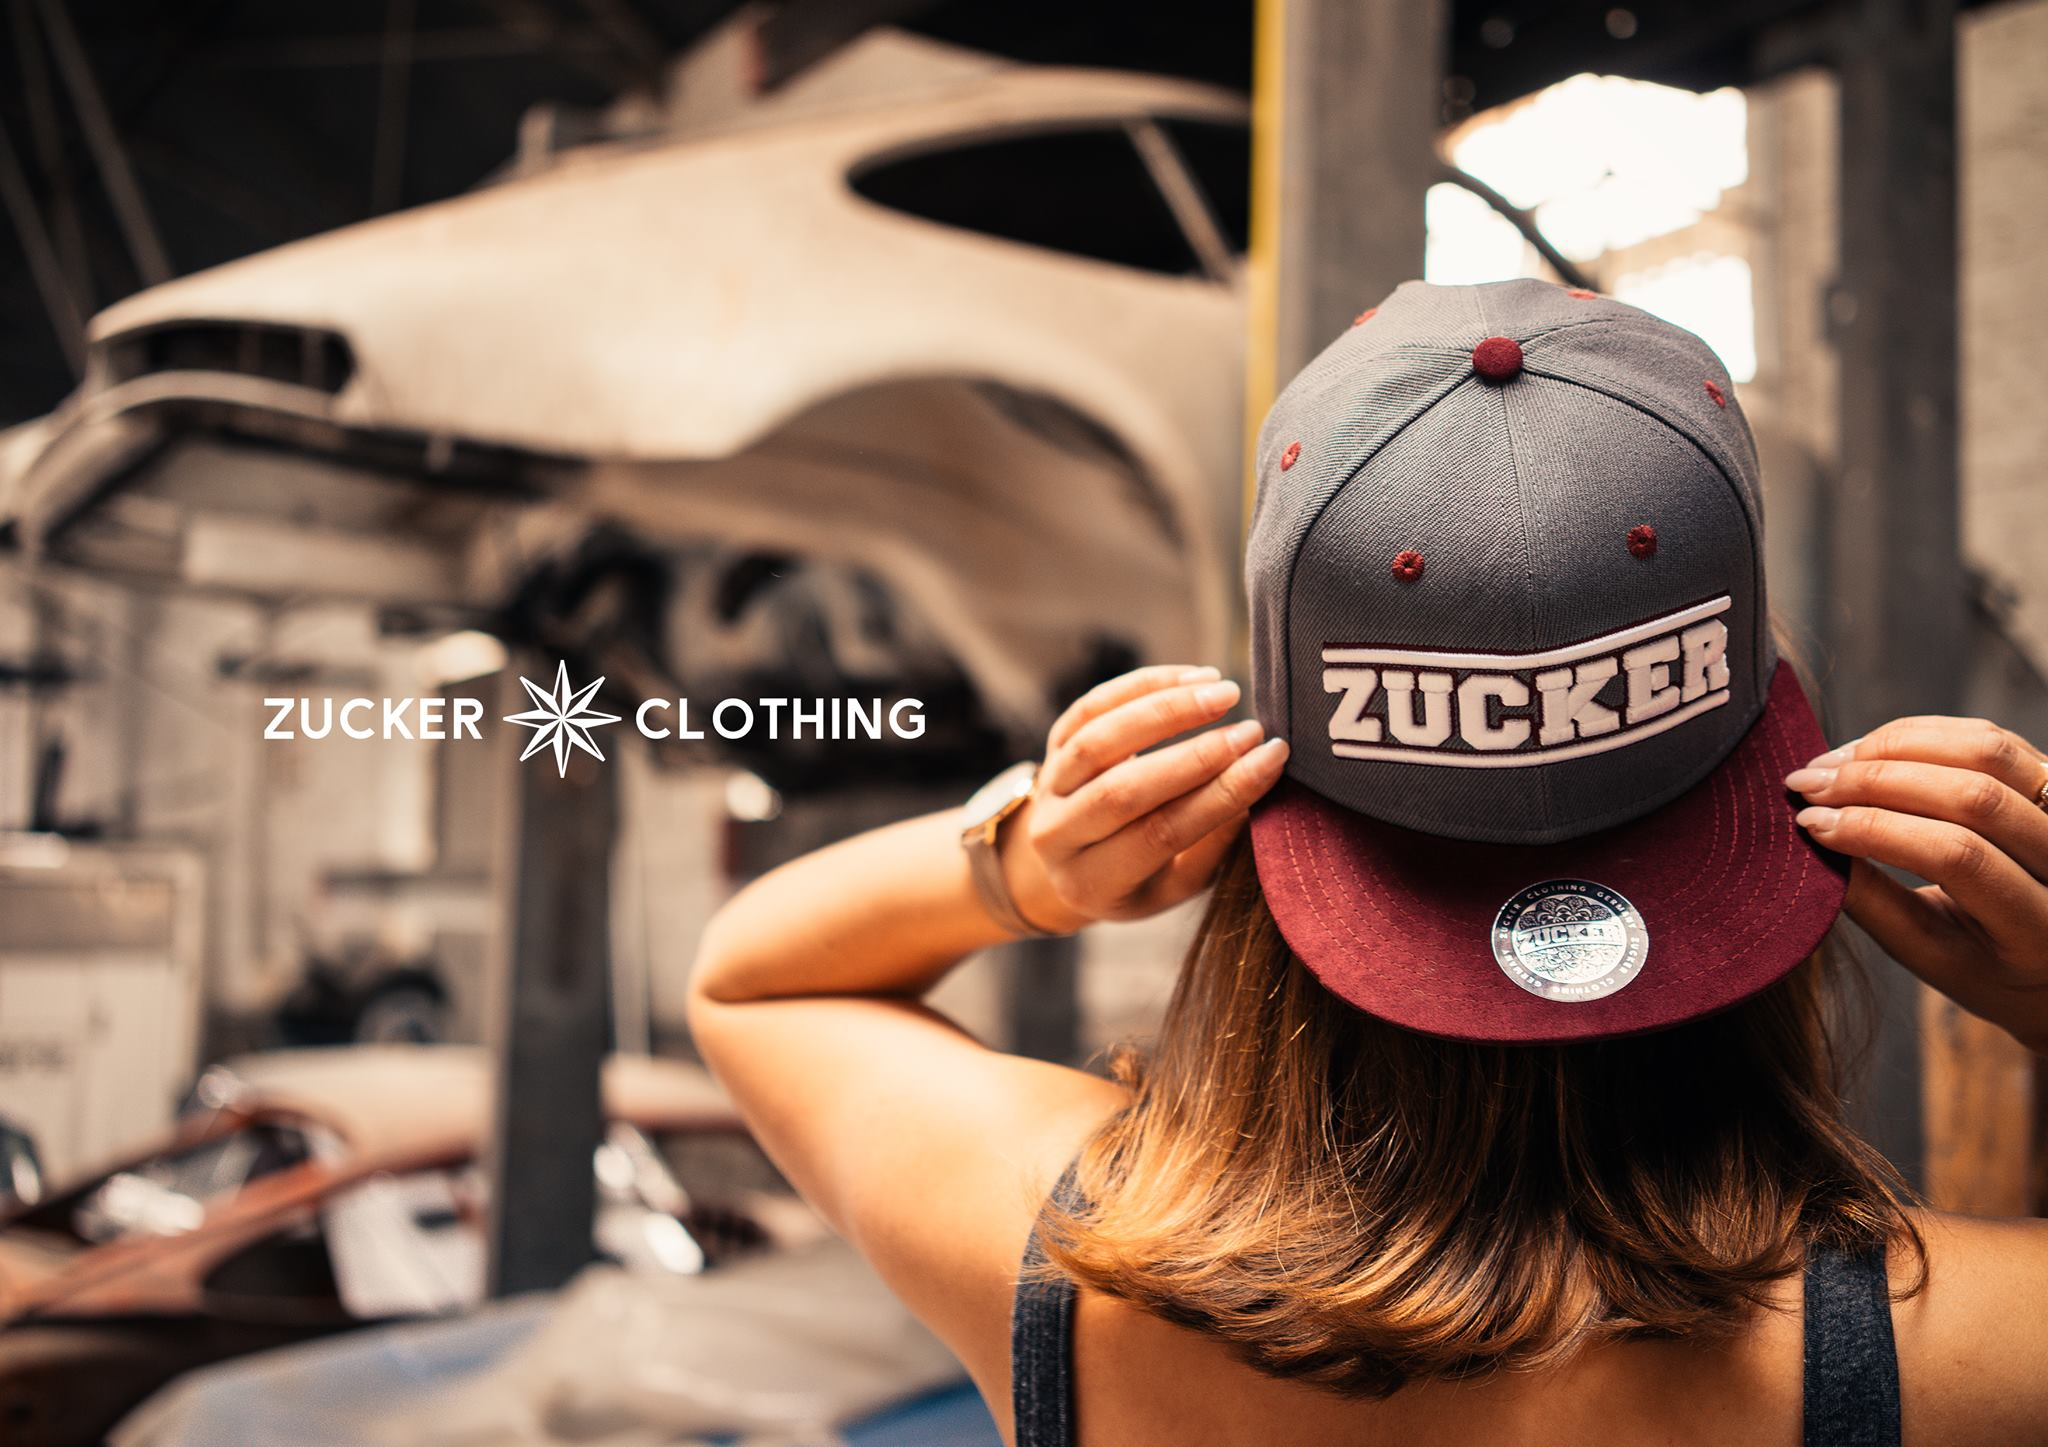 ZUCKER CLOTHING®